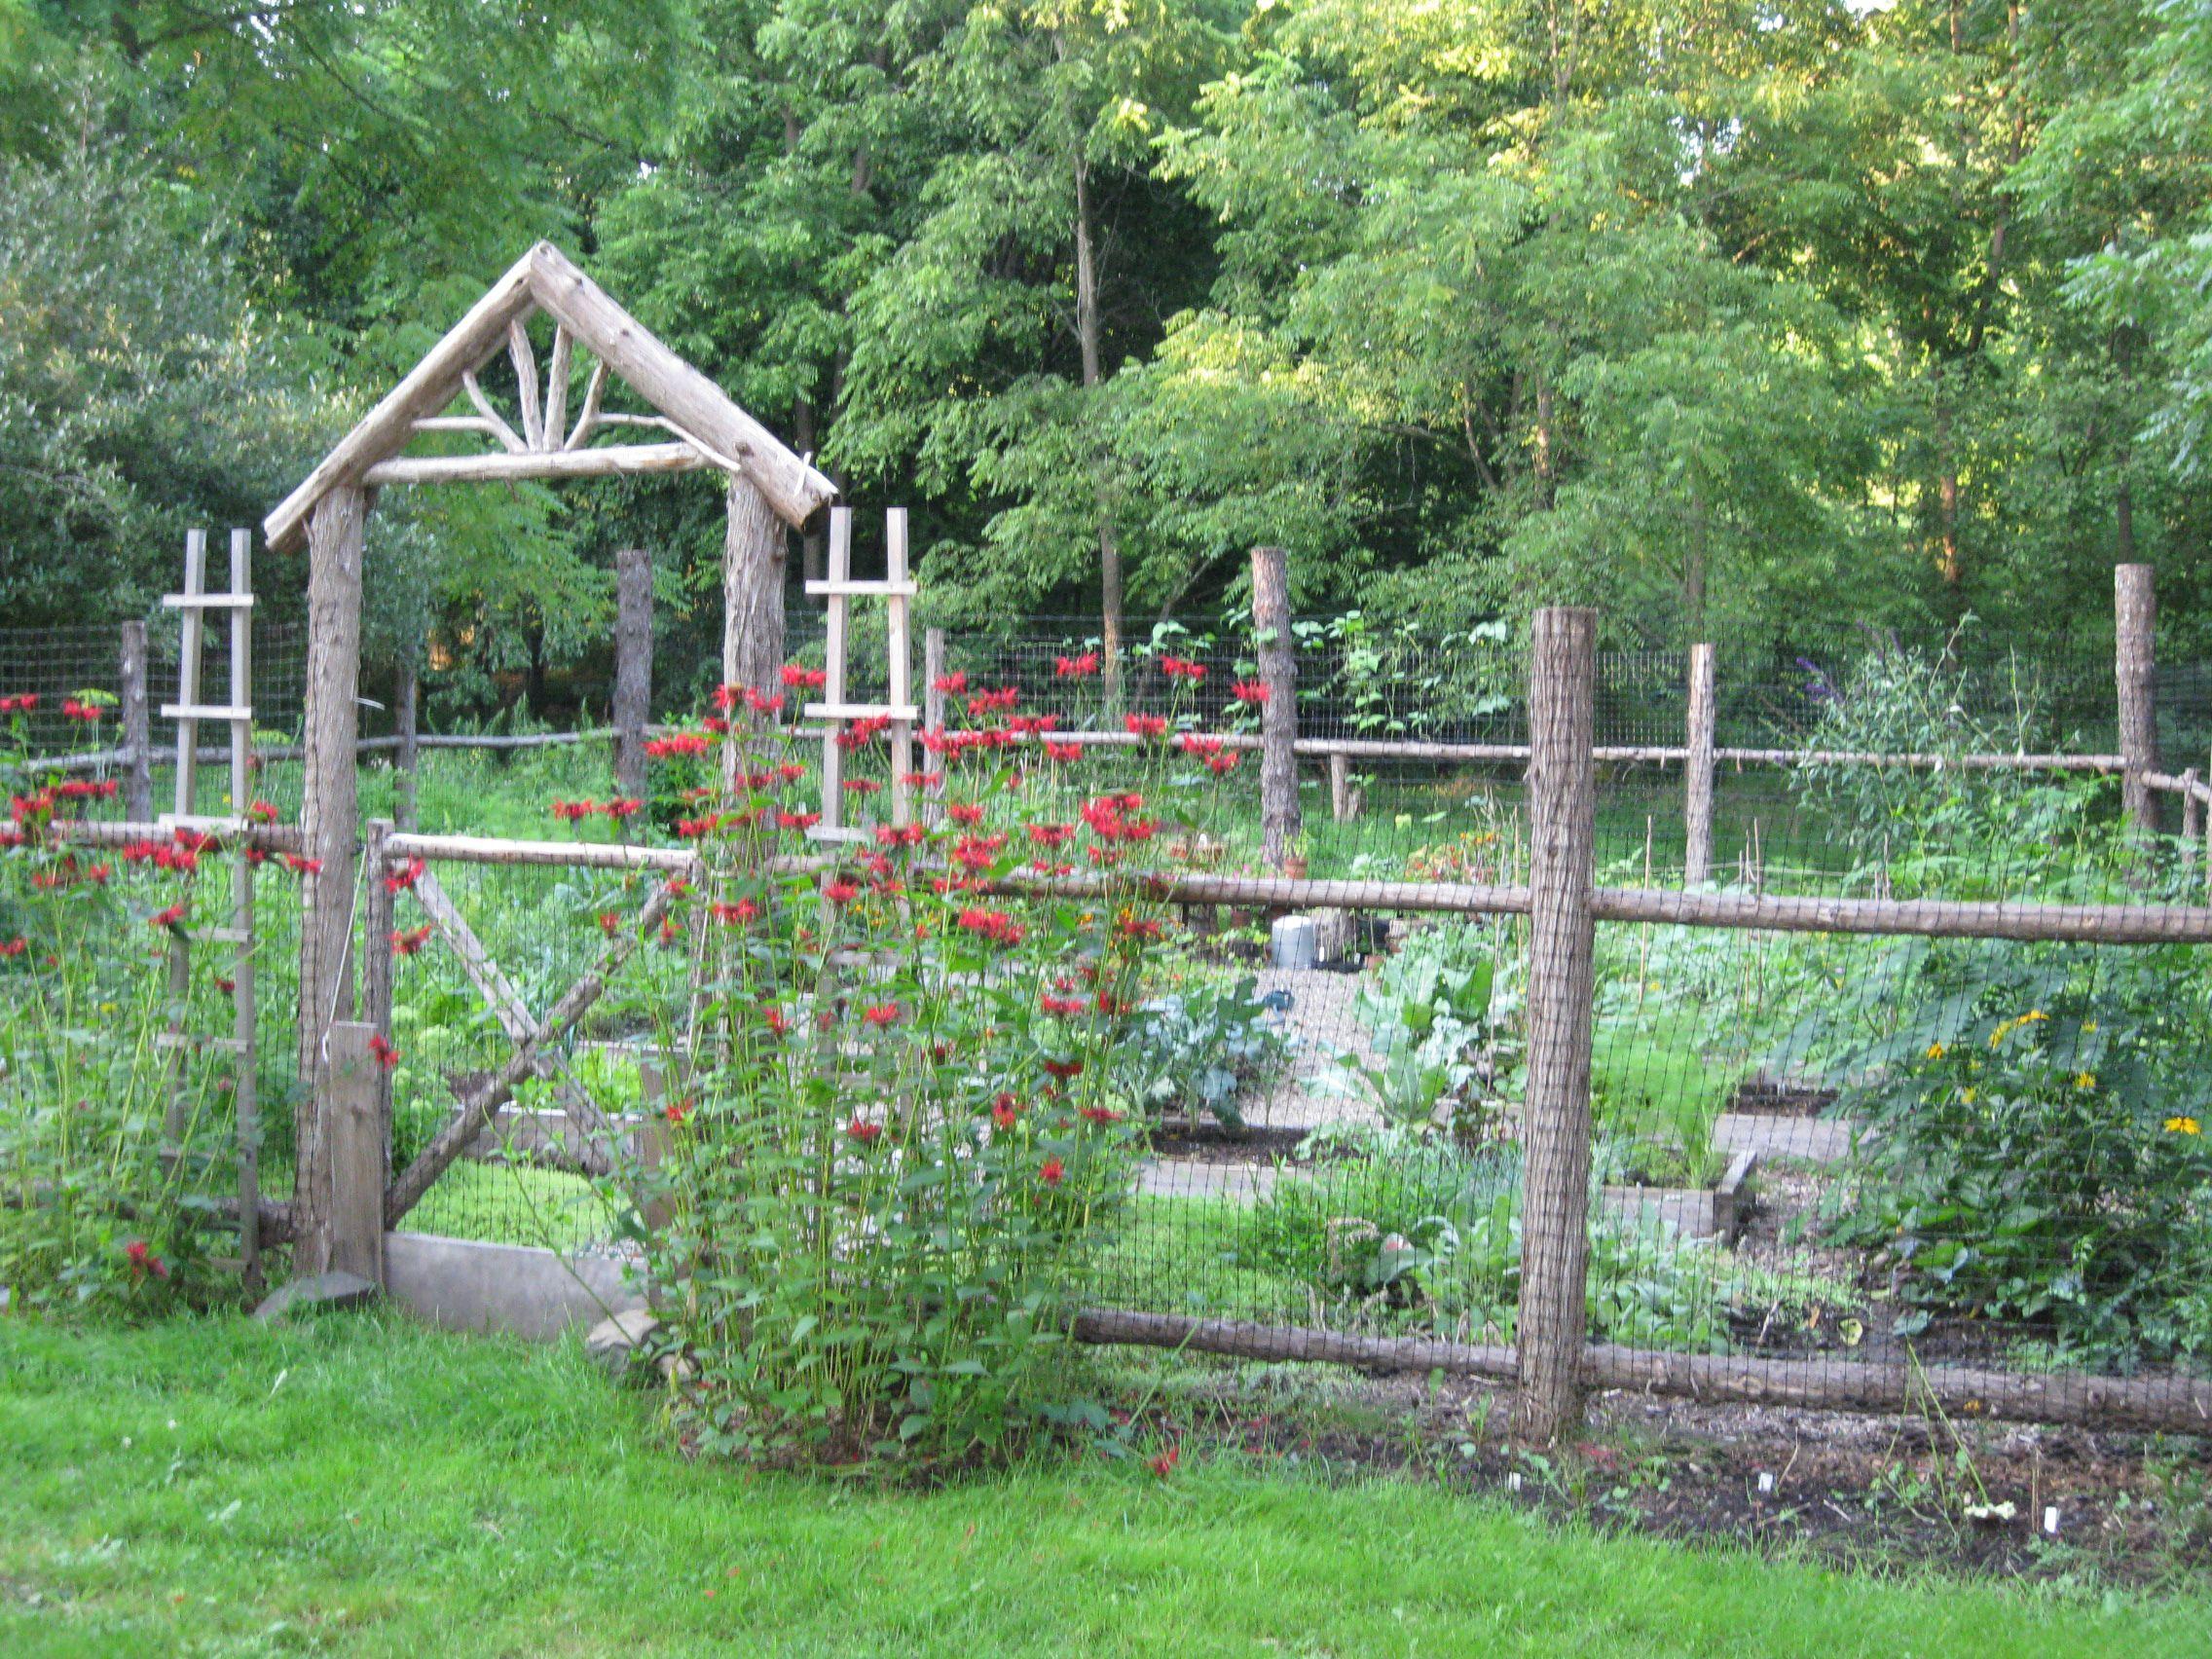 17 Diy Garden Fence Ideas To Keep Your Plants Diy Tradgard